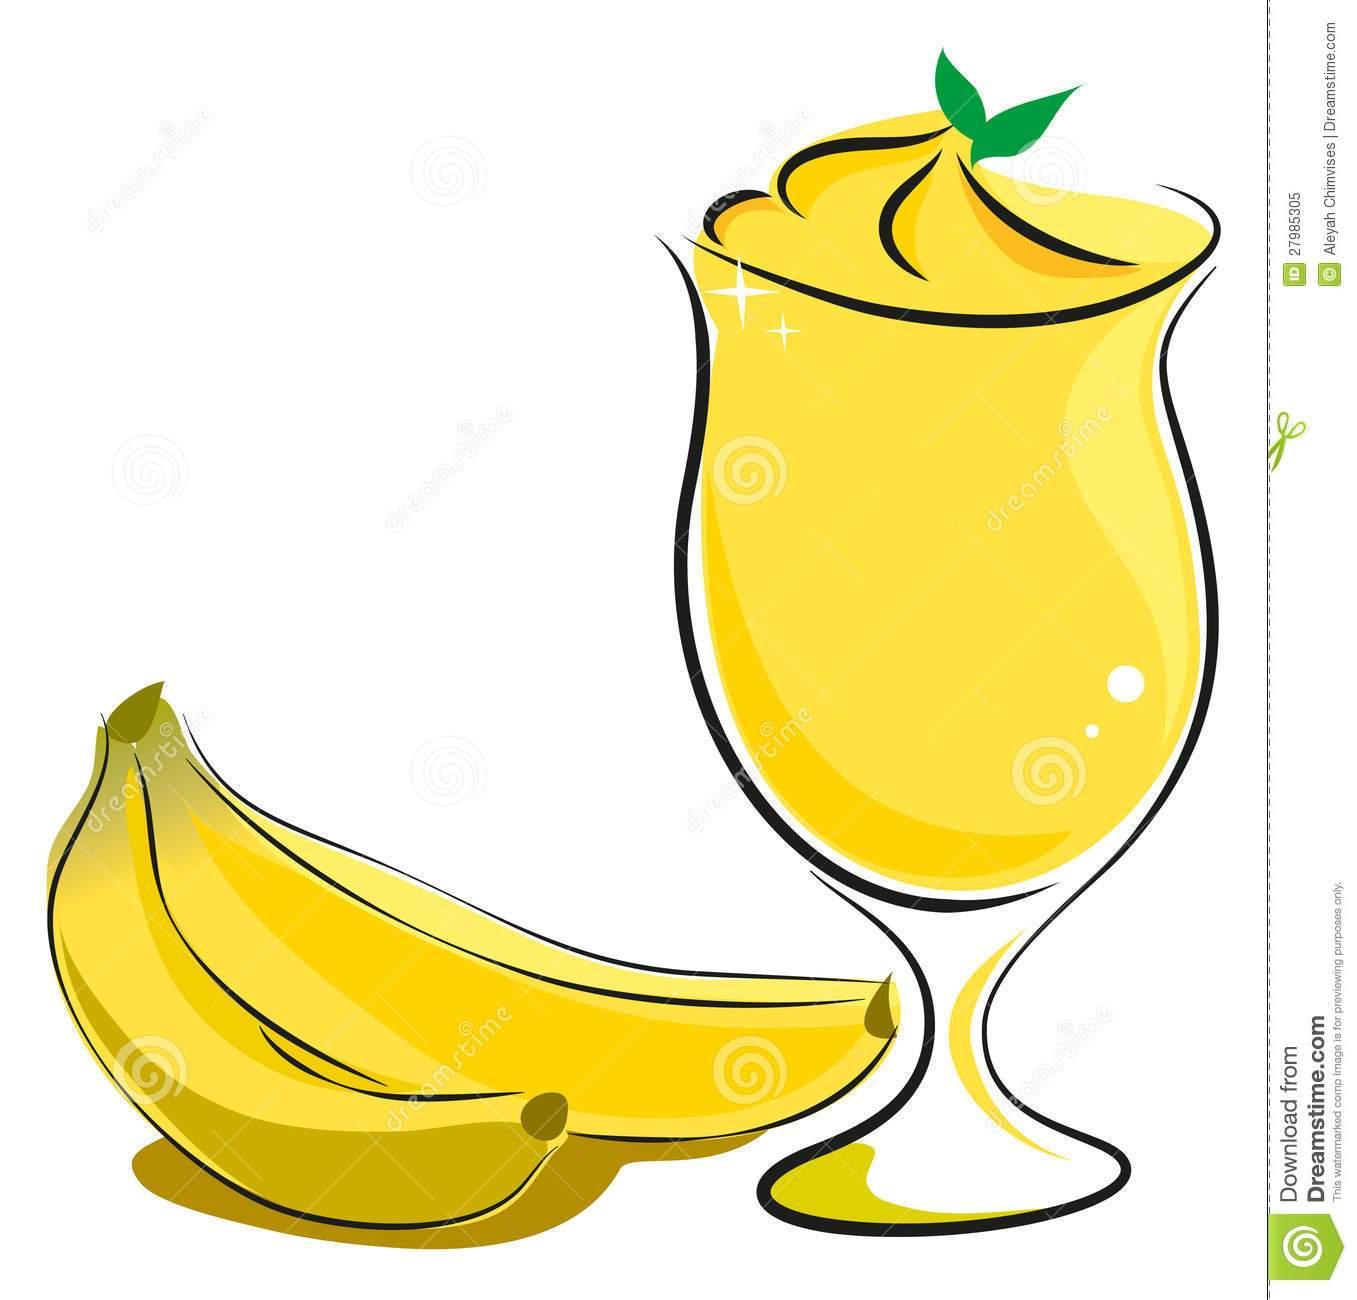 Banana milkshake clipart 5 » Clipart Portal.